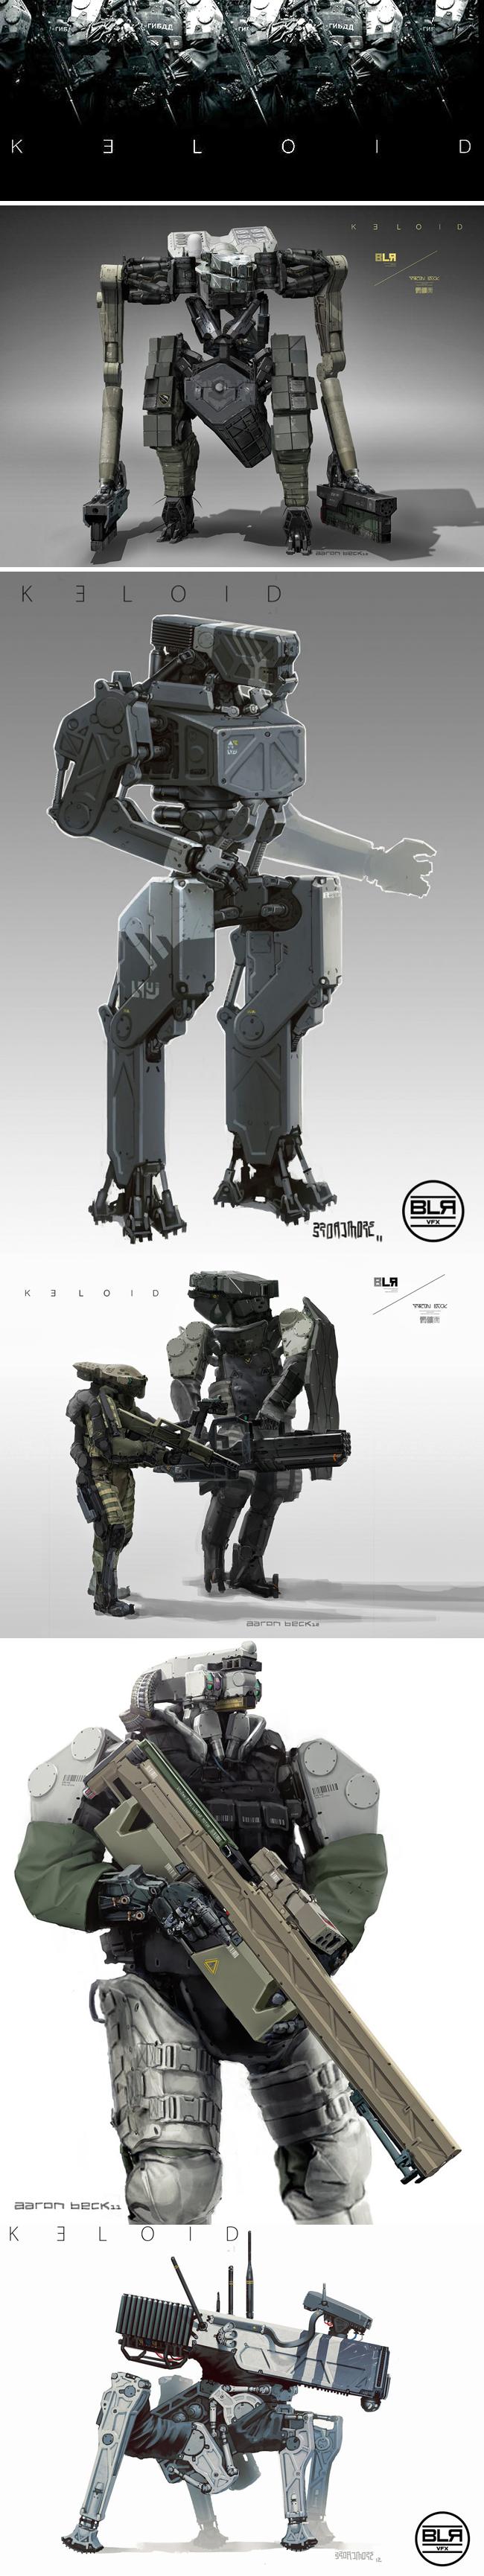 pastilla-arte-digital-madrid-concept-art-academiac10-videojuegos